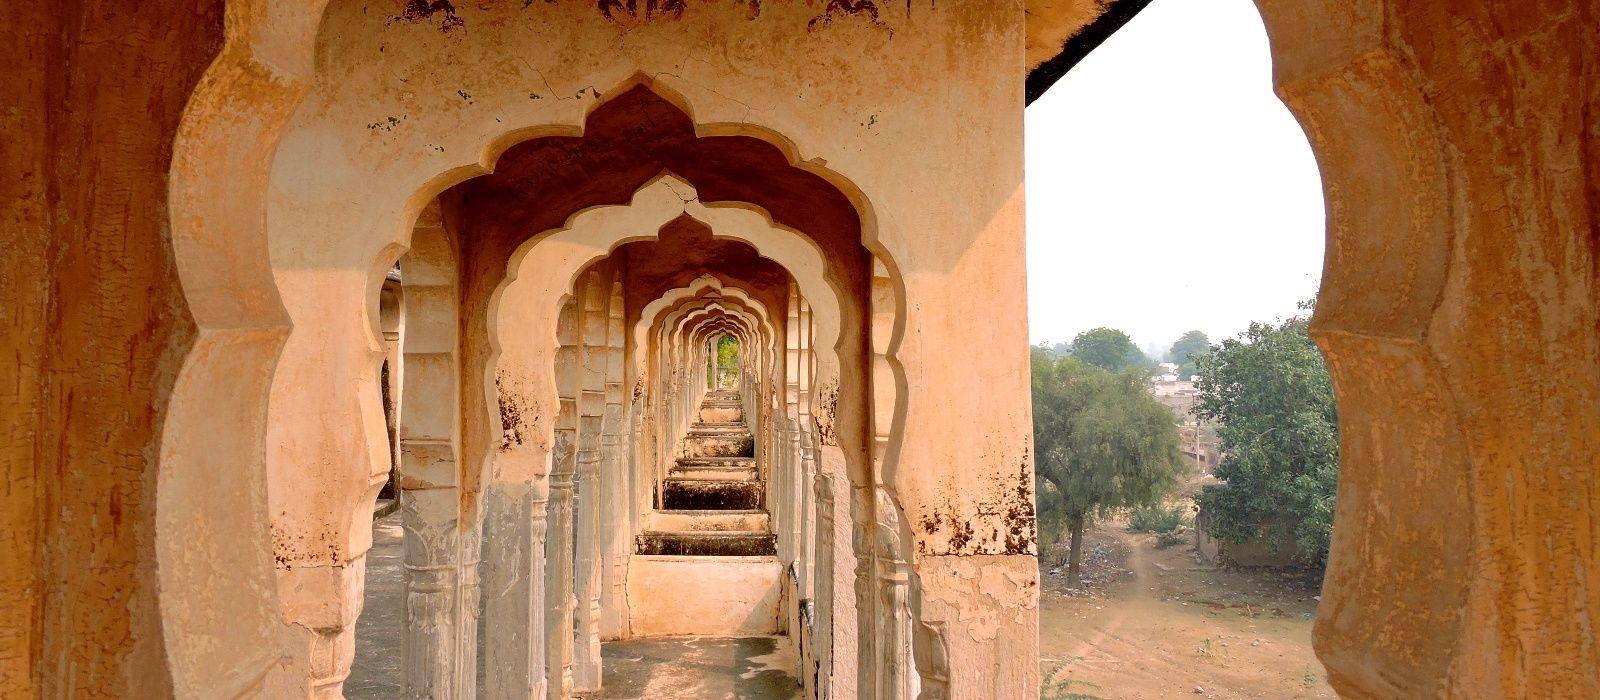 Destination Churu North India